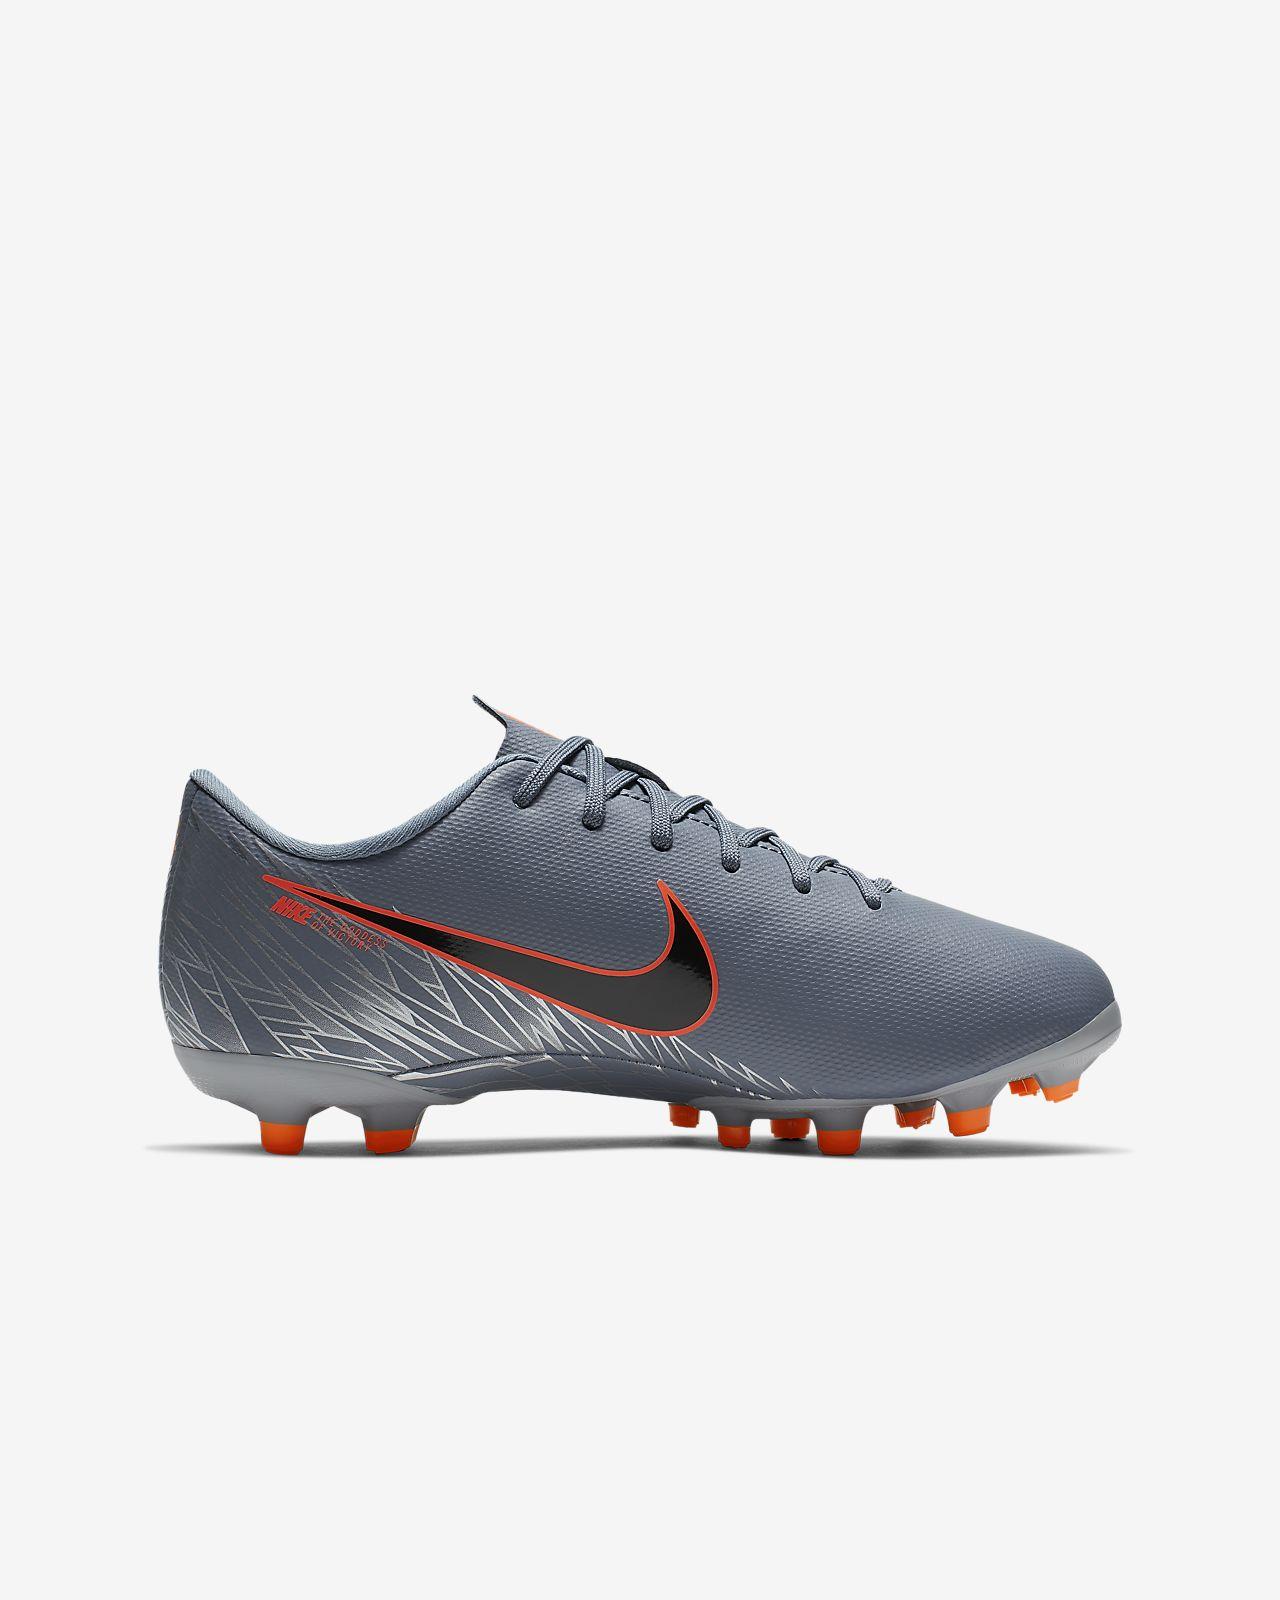 76d7130ad1 Nike Jr. Mercurial Vapor XII Academy Little/Big Kids' Multi-Ground Soccer  Cleat